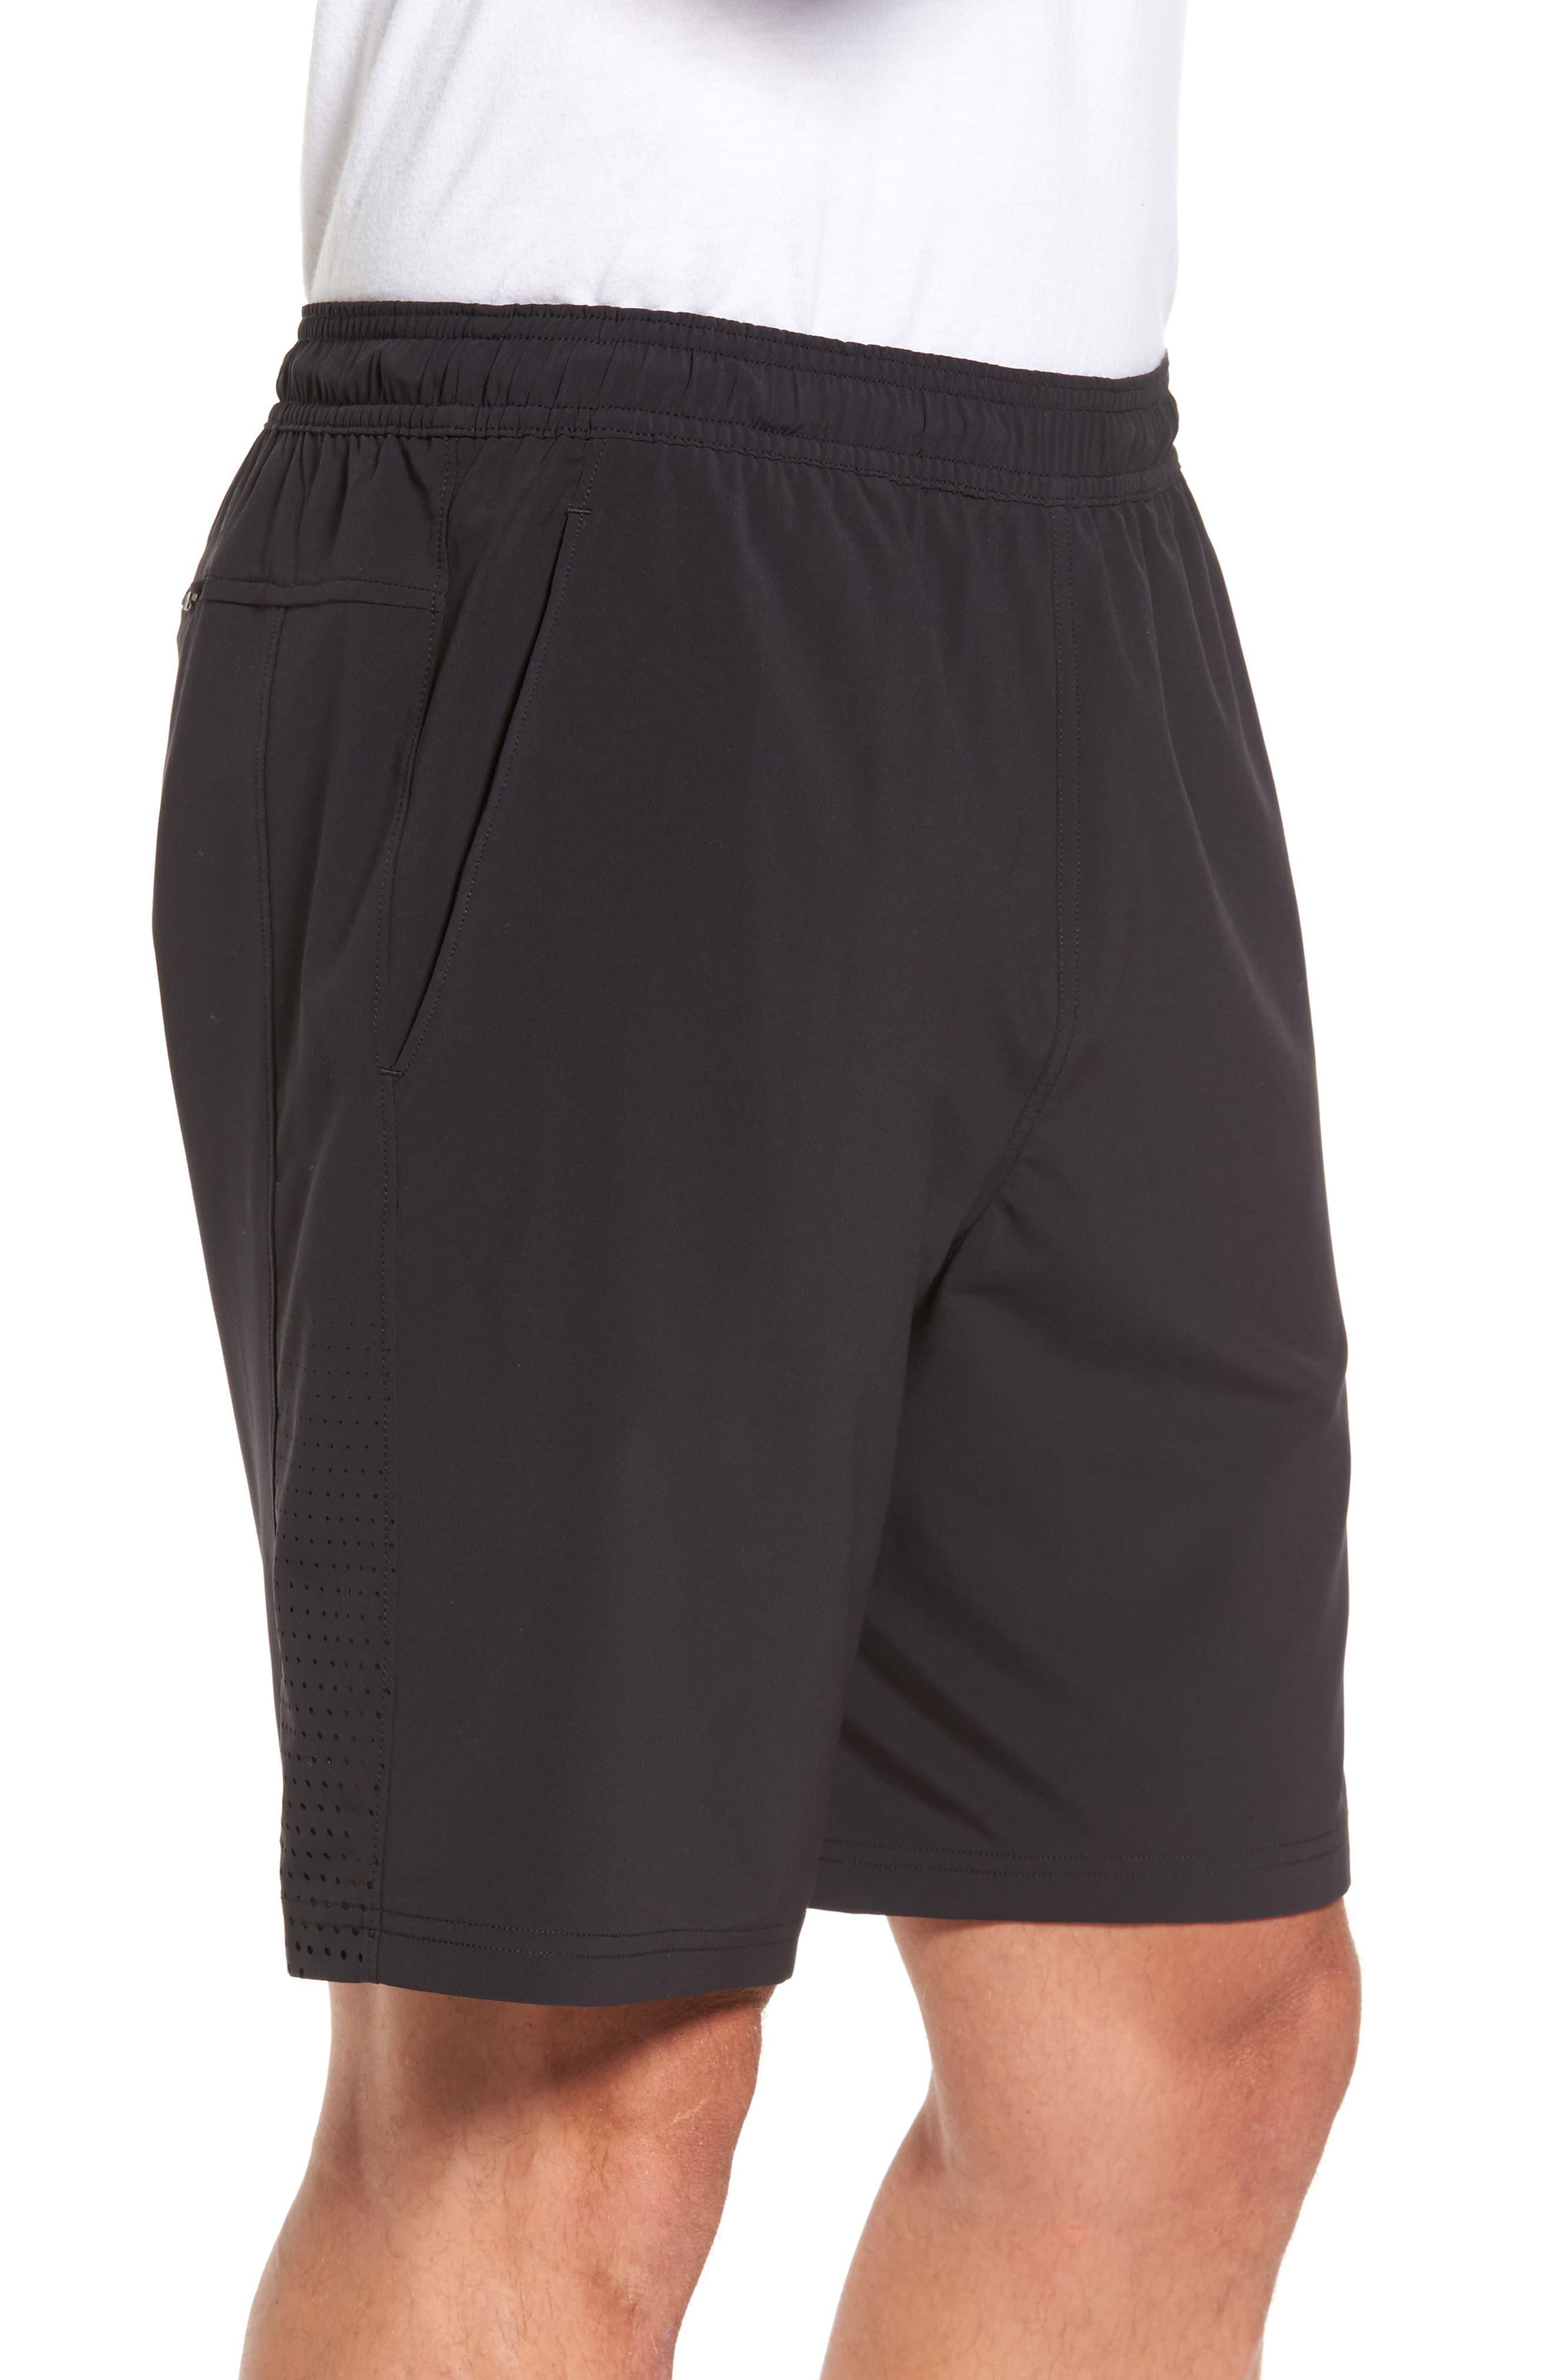 Graphite Core Athletic Shorts,                             Alternate thumbnail 3, color,                             BLACK